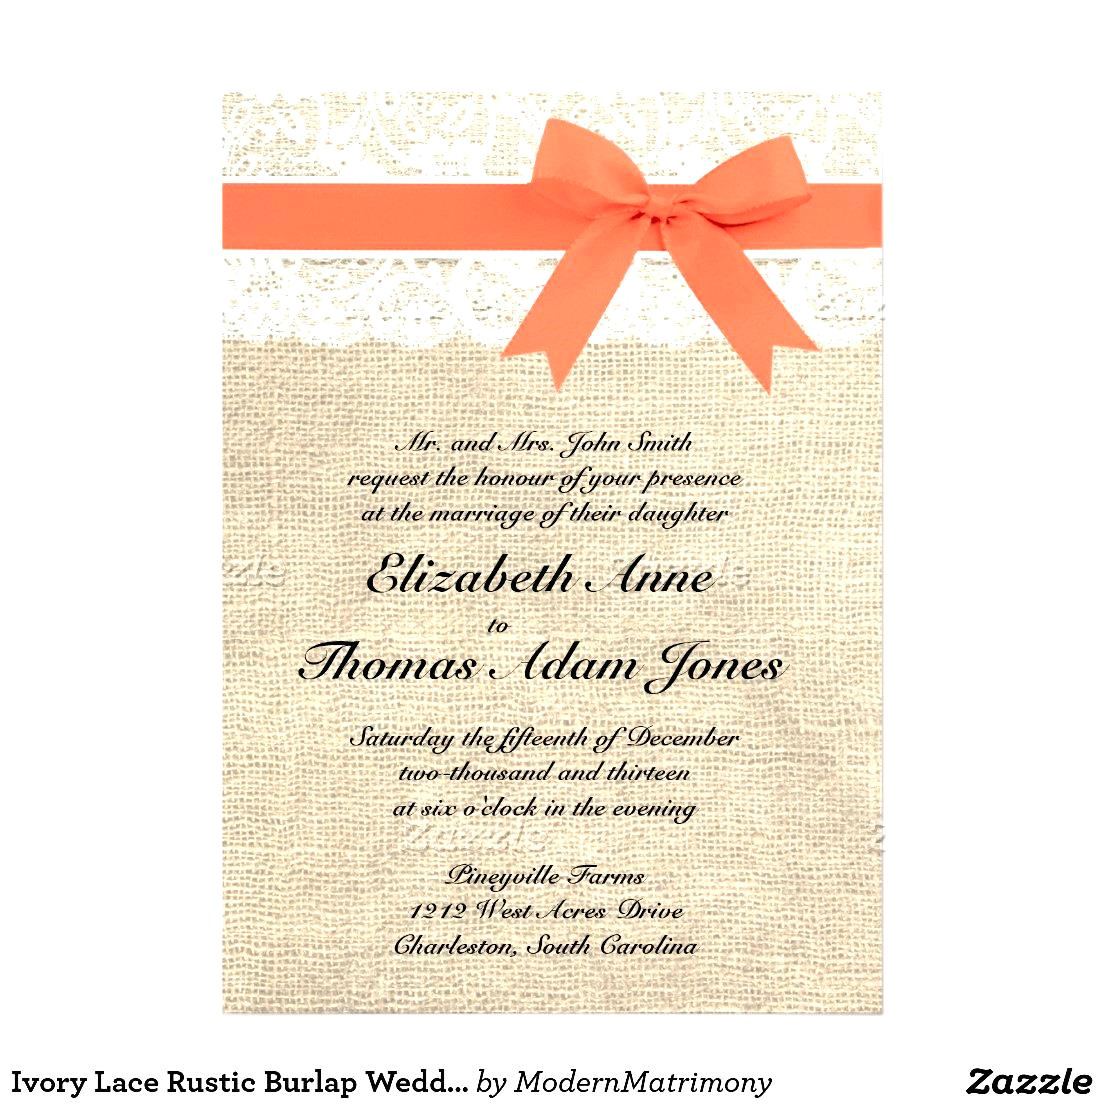 wedding card sample delectable template indian wording samples kerala hindu invitation text pakistan format in hindi invitations designs design choice image party jpg